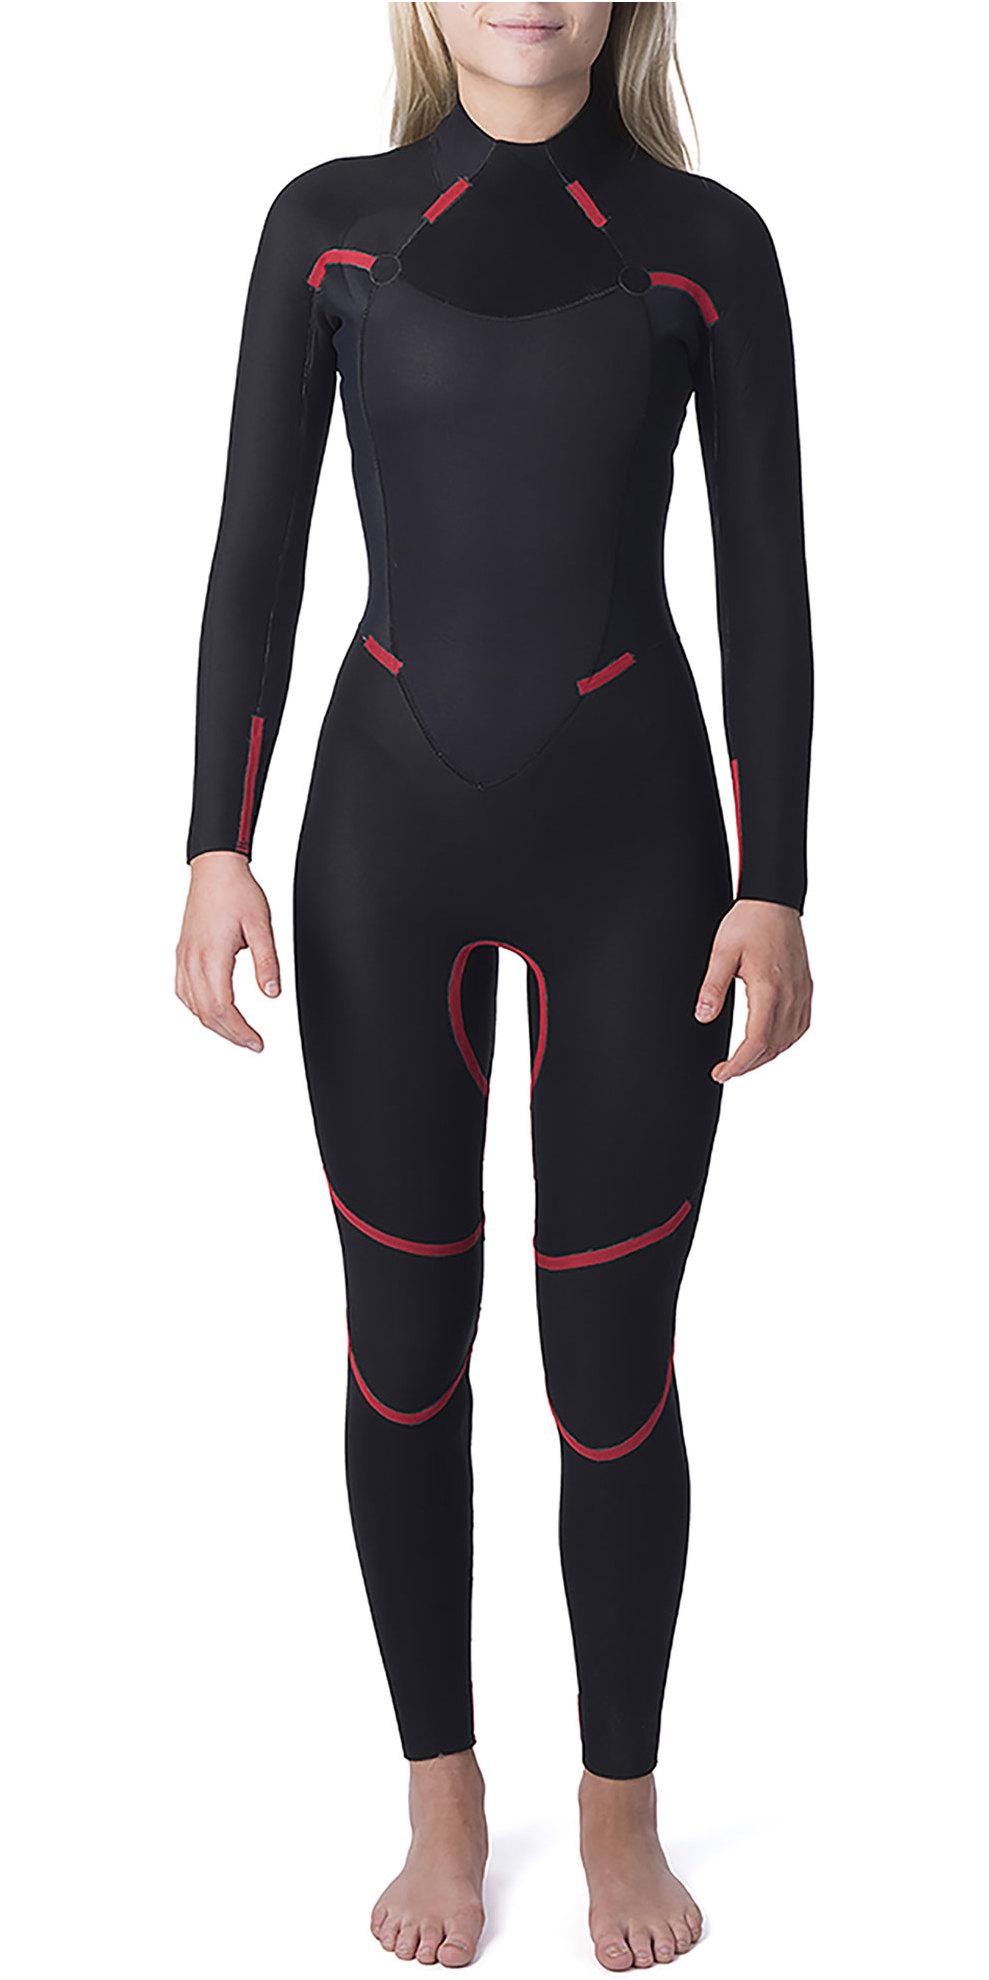 2019 Rip Curl Womens Omega 3/2mm Back Zip GBS Wetsuit WSM4LW Black